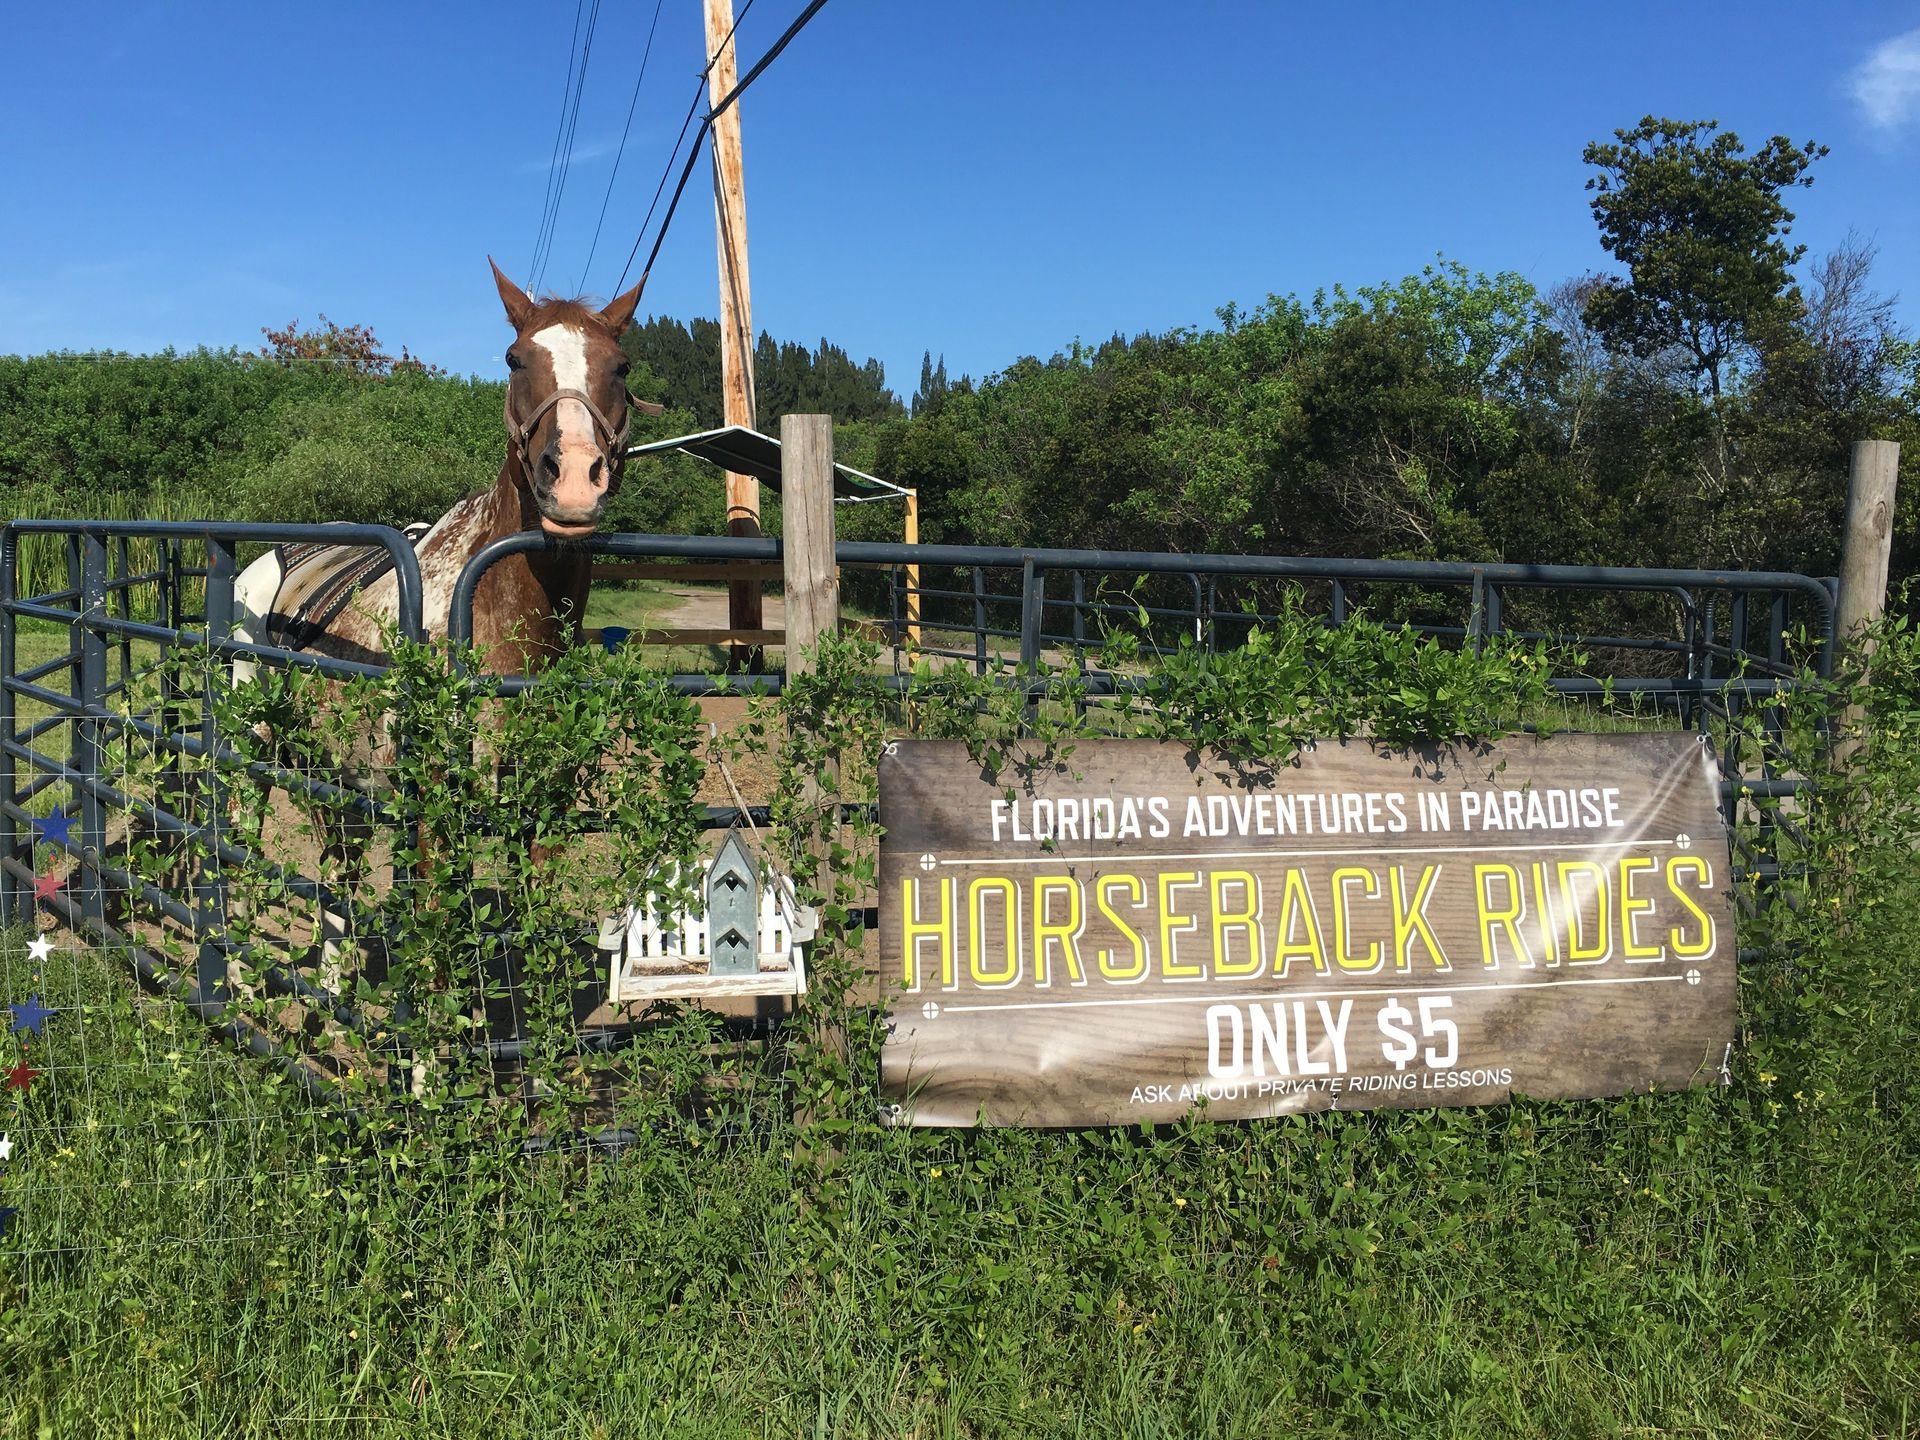 obloy_family_ranch_horseback_riding_florida.jpg